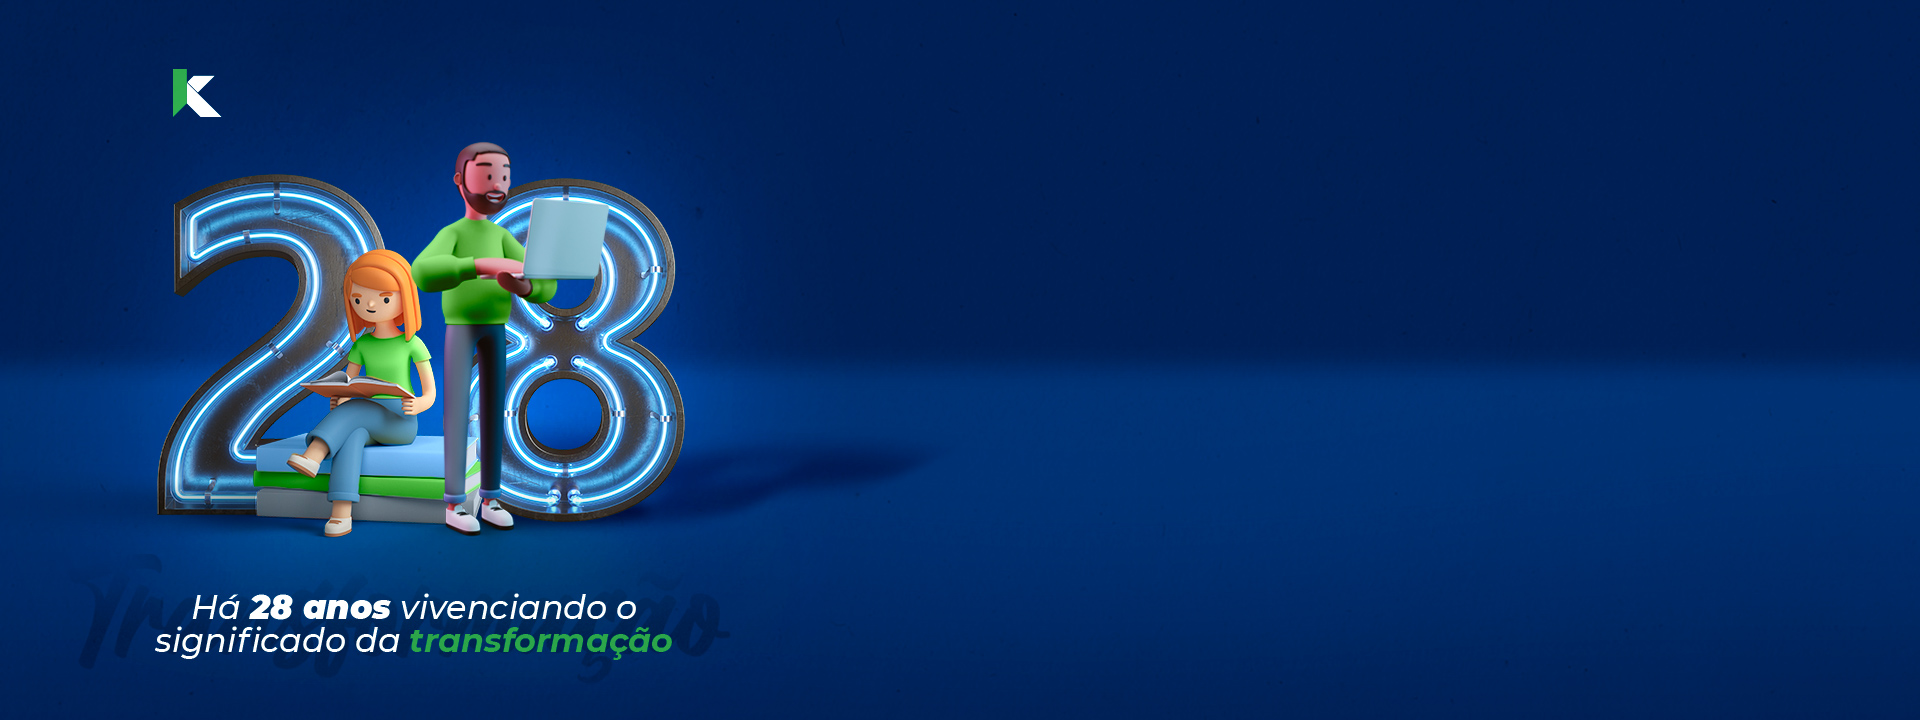 Krypton_BPO_100%_Digital